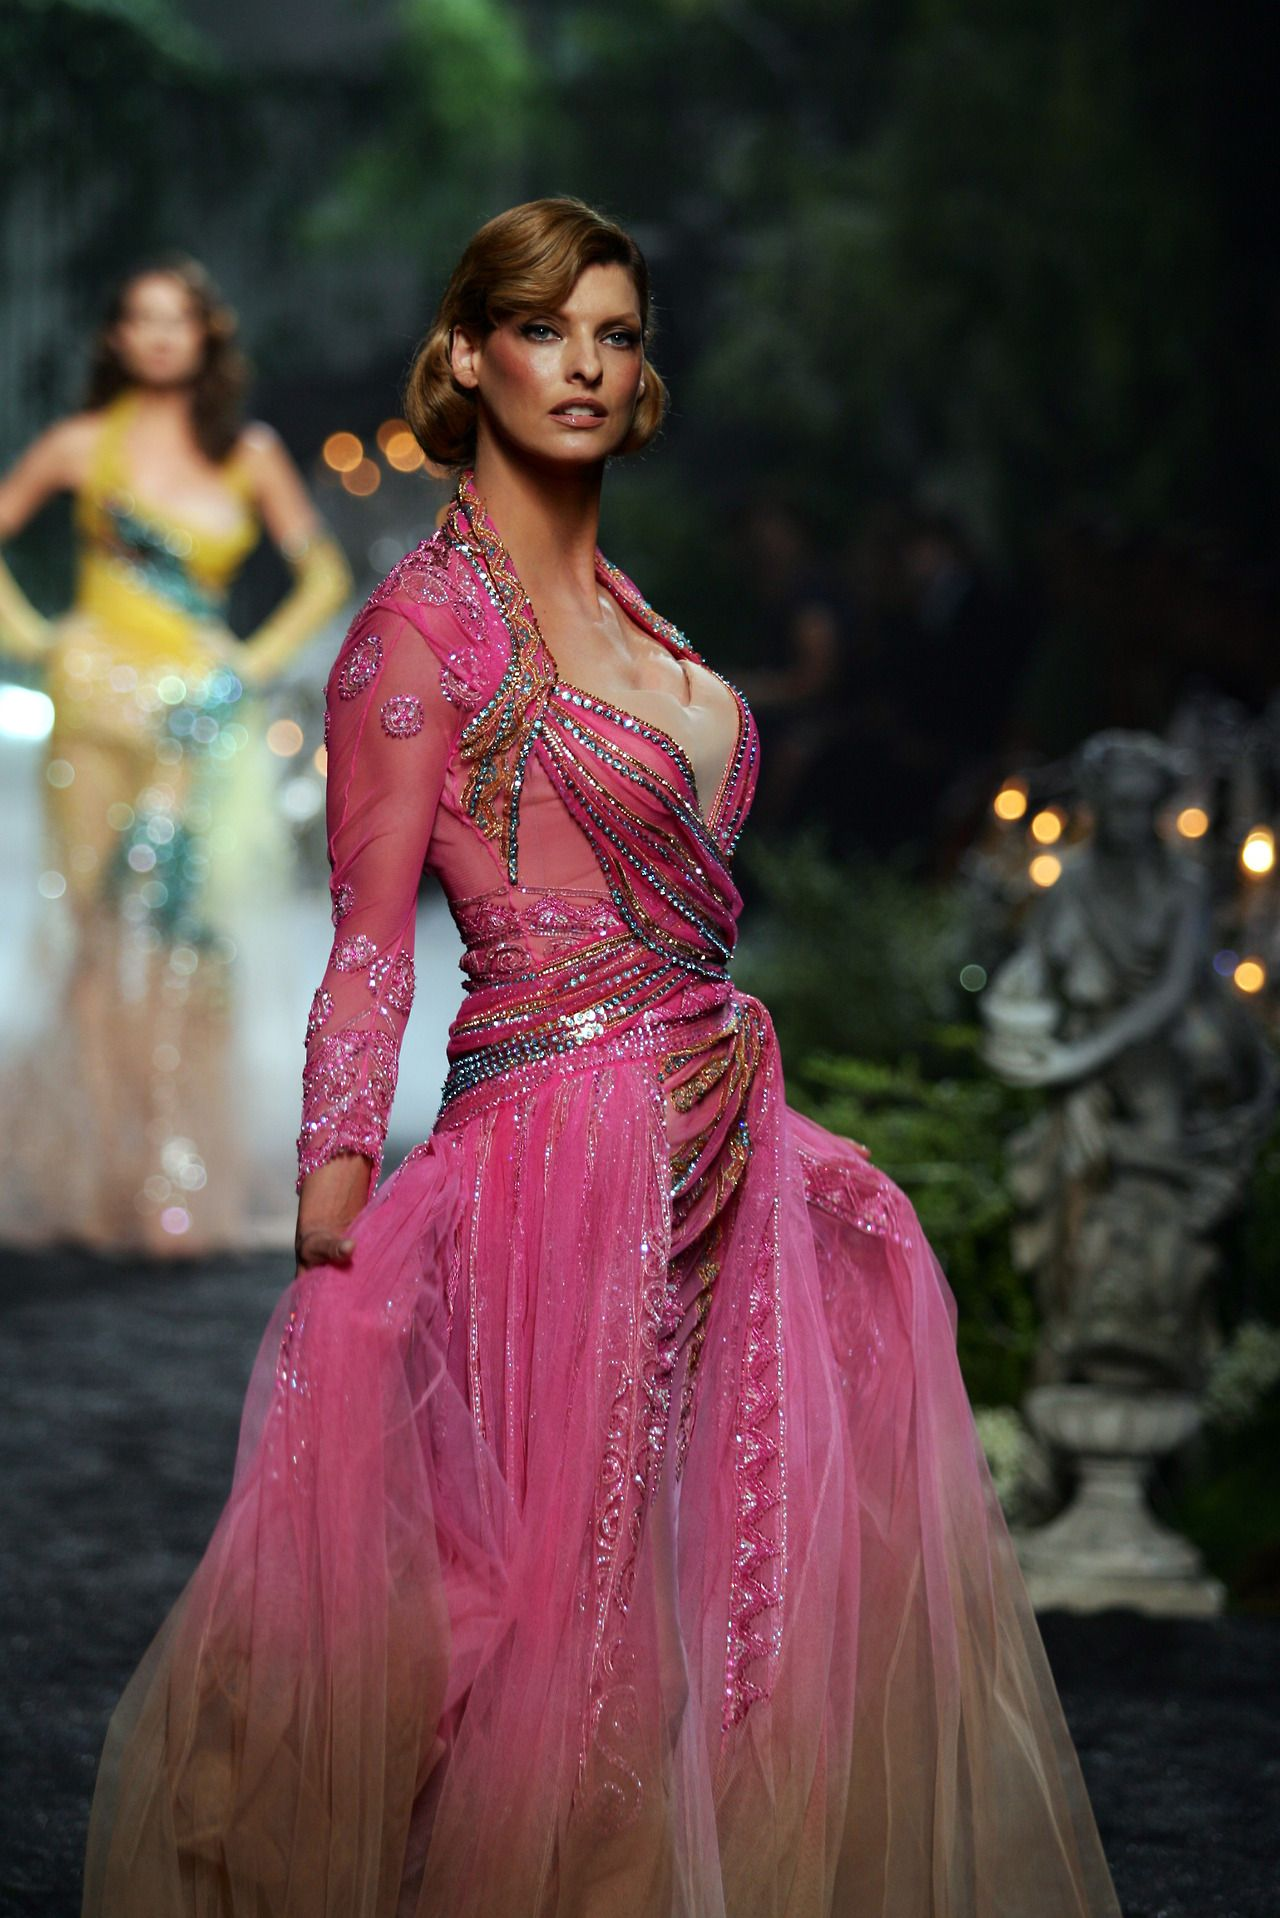 luckymag: #TBT: Linda Evangelista\'s Dior Dress Is The Sparkliest ...